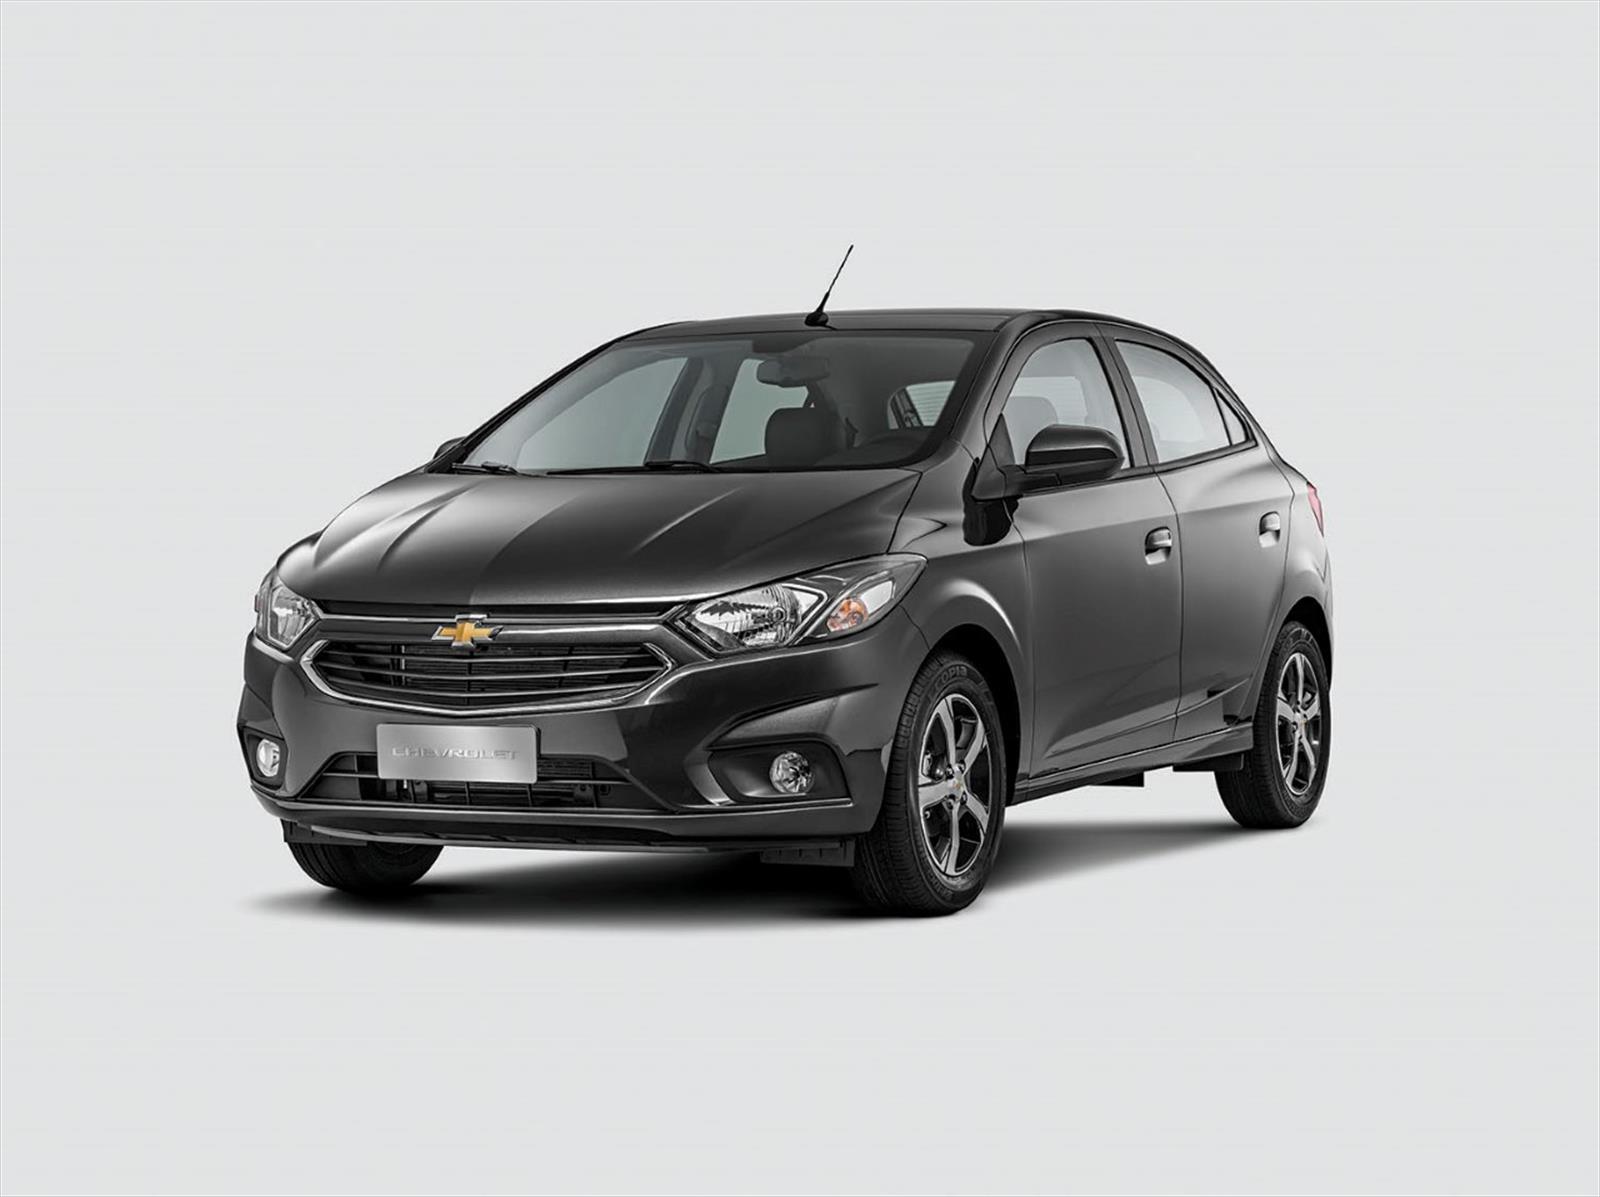 Chevrolet suv hertz for Affordable motors winston salem nc reviews